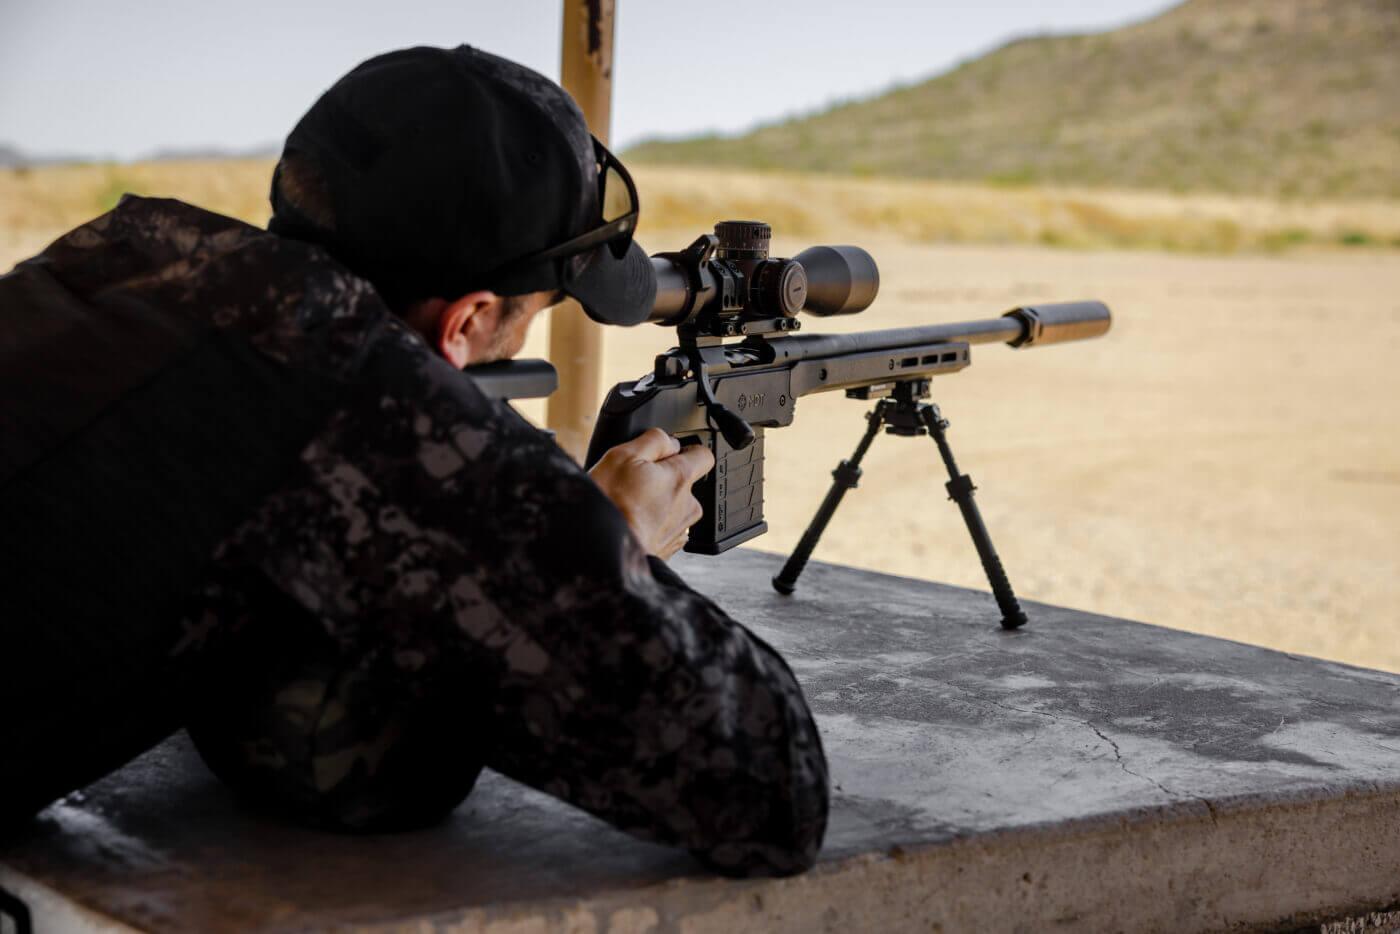 Shooting rifle at precision rifle training